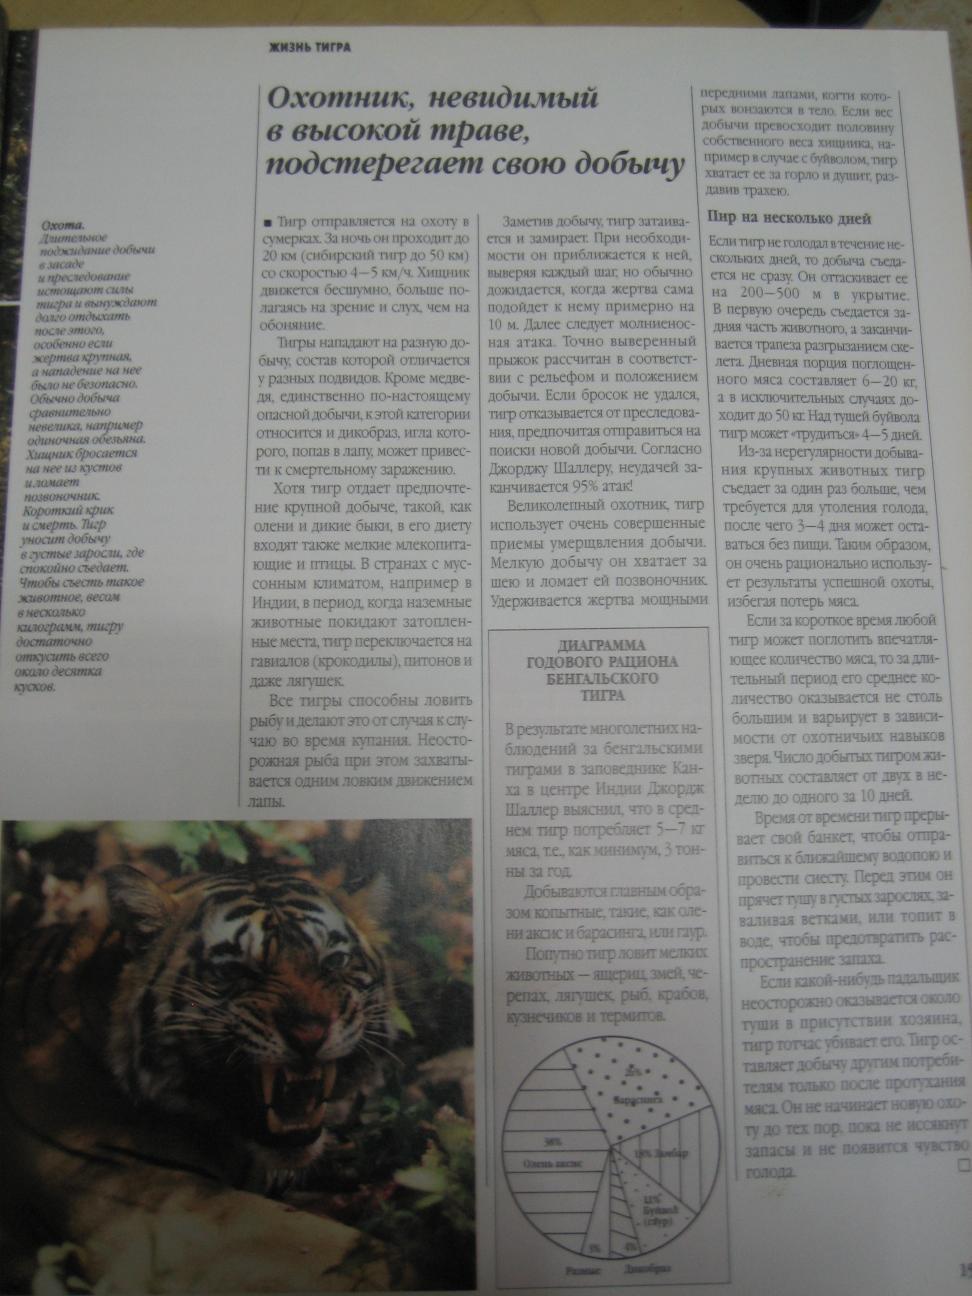 http://www.ljplus.ru/img4/d/o/doctor_insulin/IMG_7943.jpg